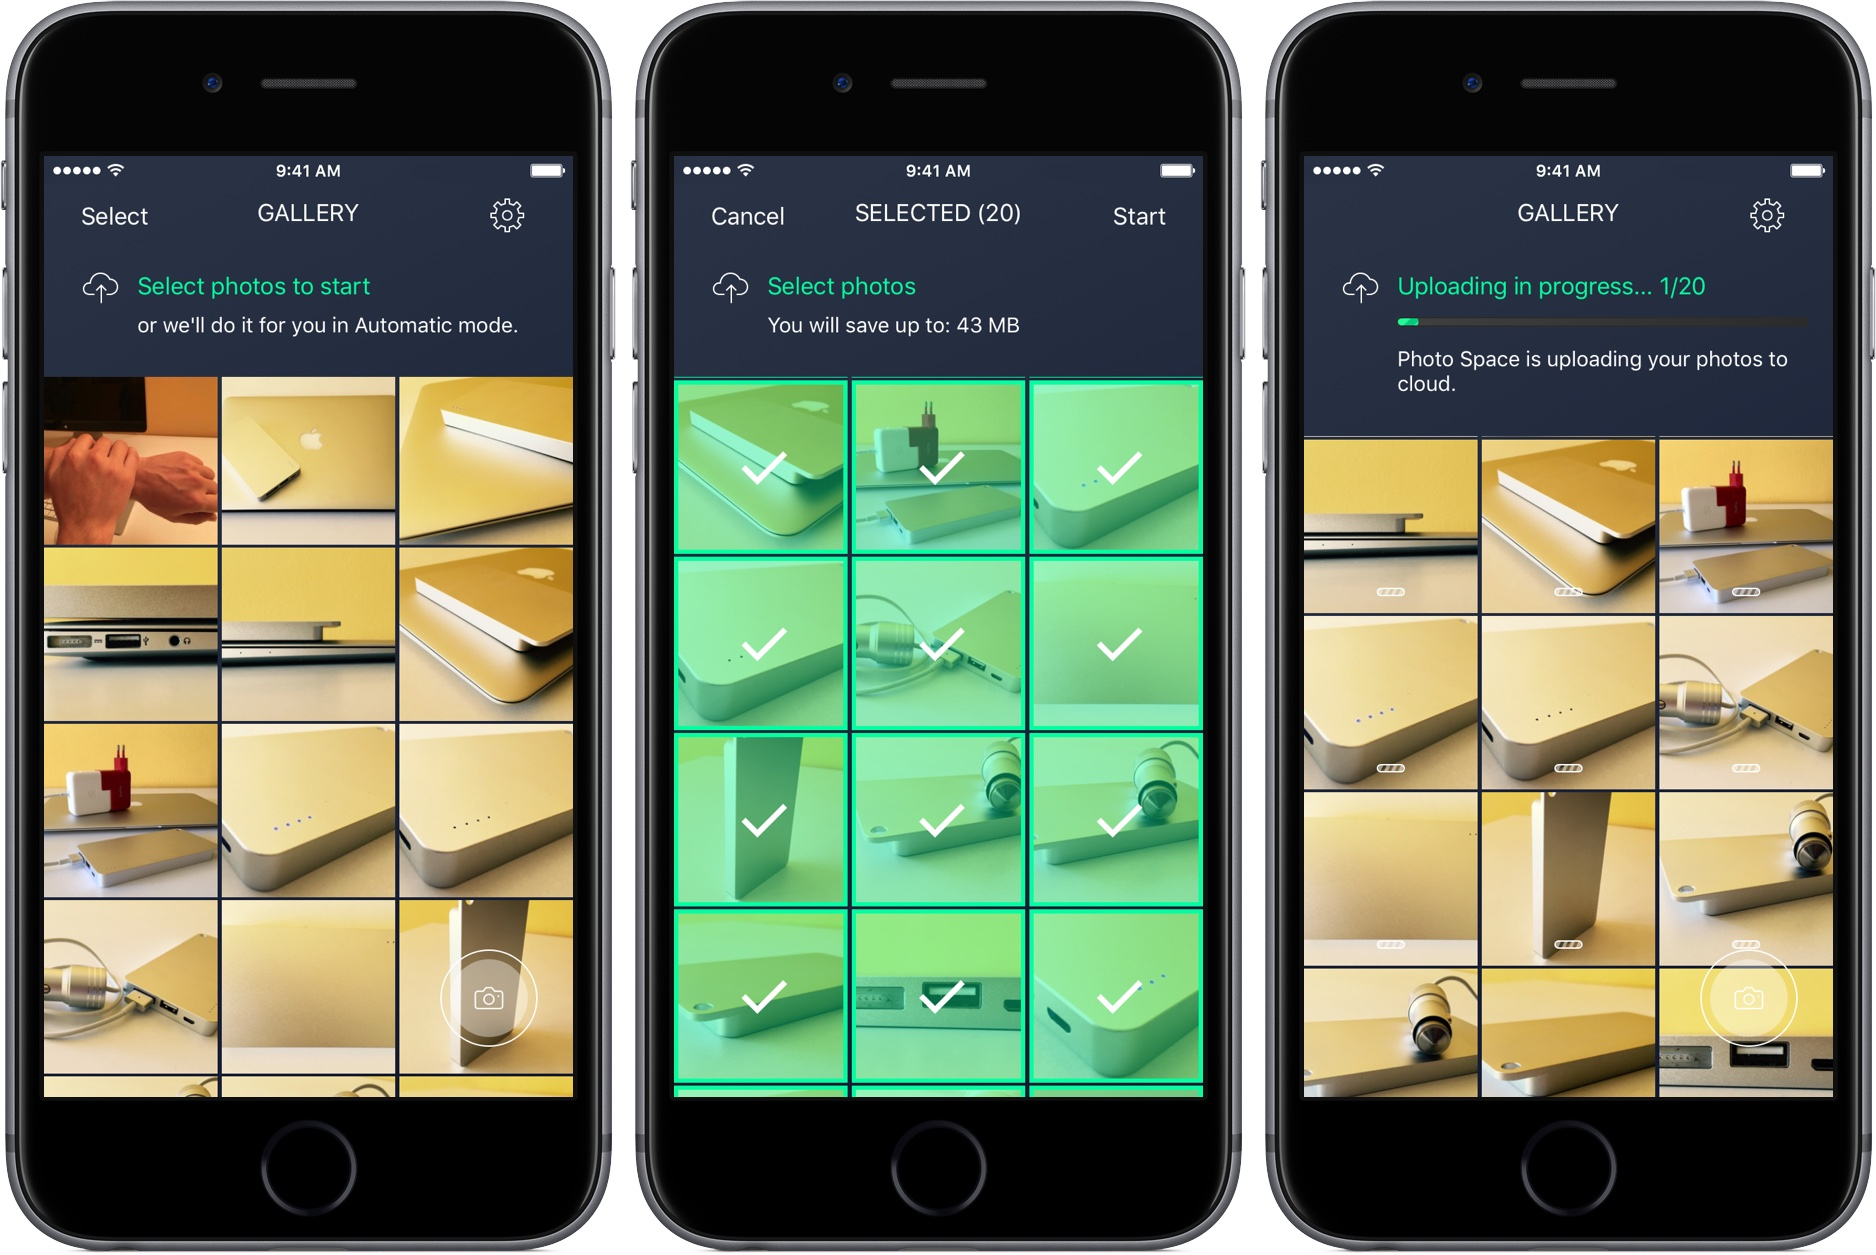 Avast Photo Space 1.0 for iOS iPhone screenshot 002